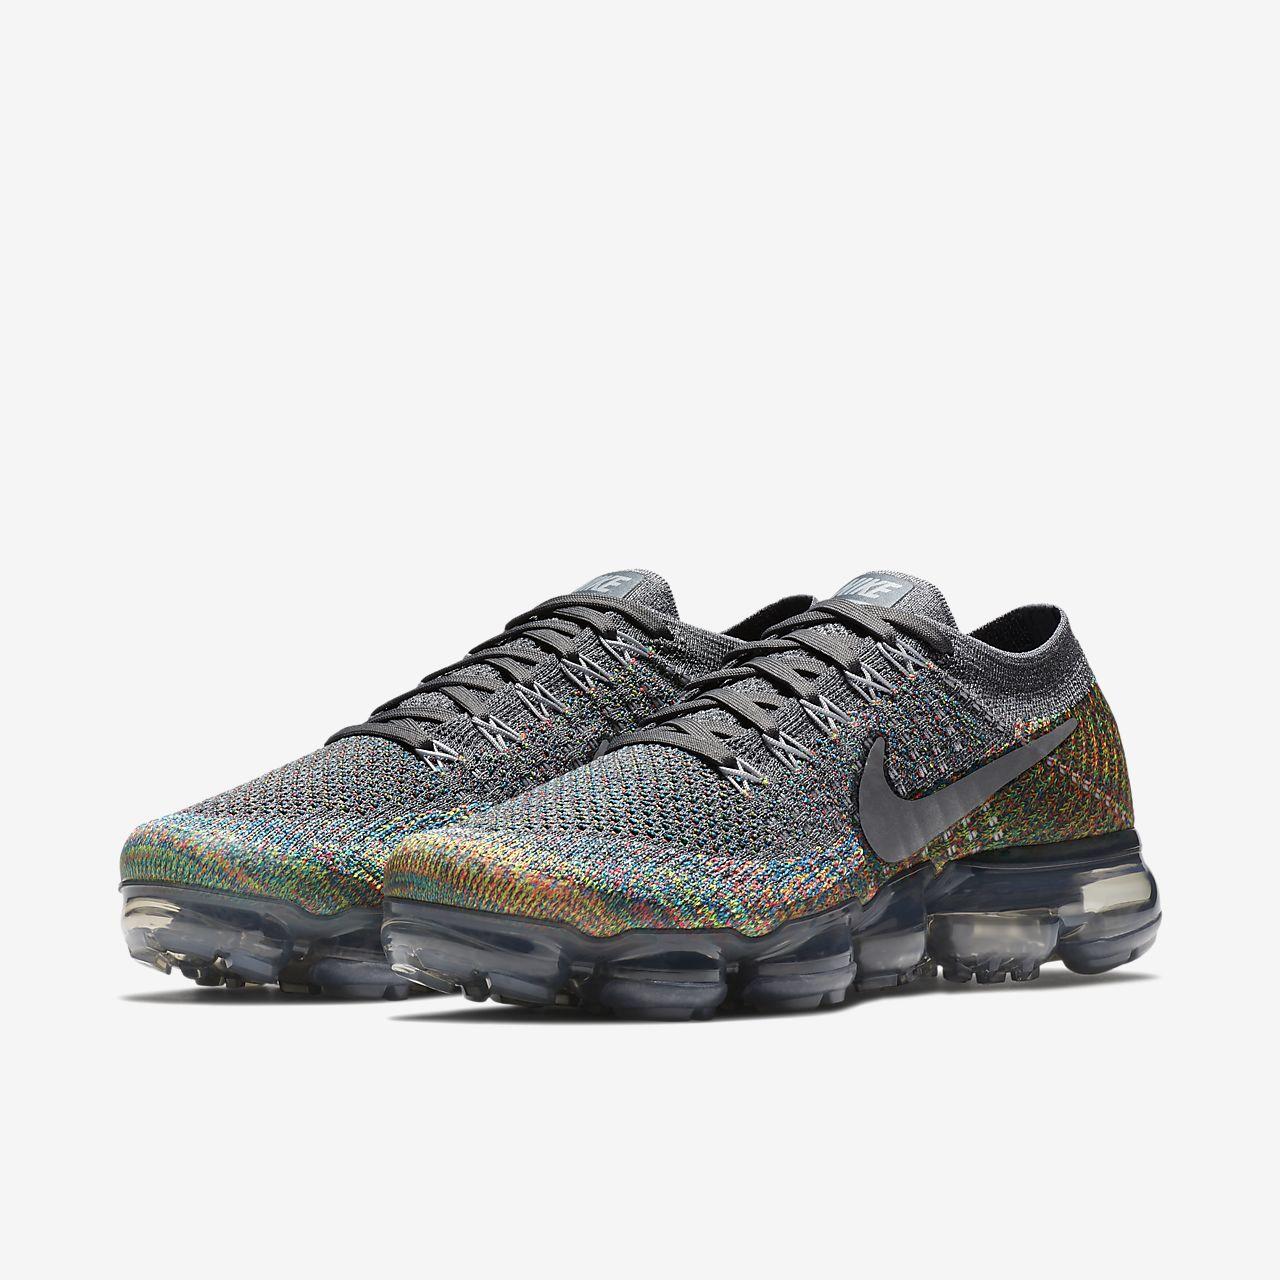 Pour Air 21a50e Chaussures Vapormax Nike Vente qfvYHI